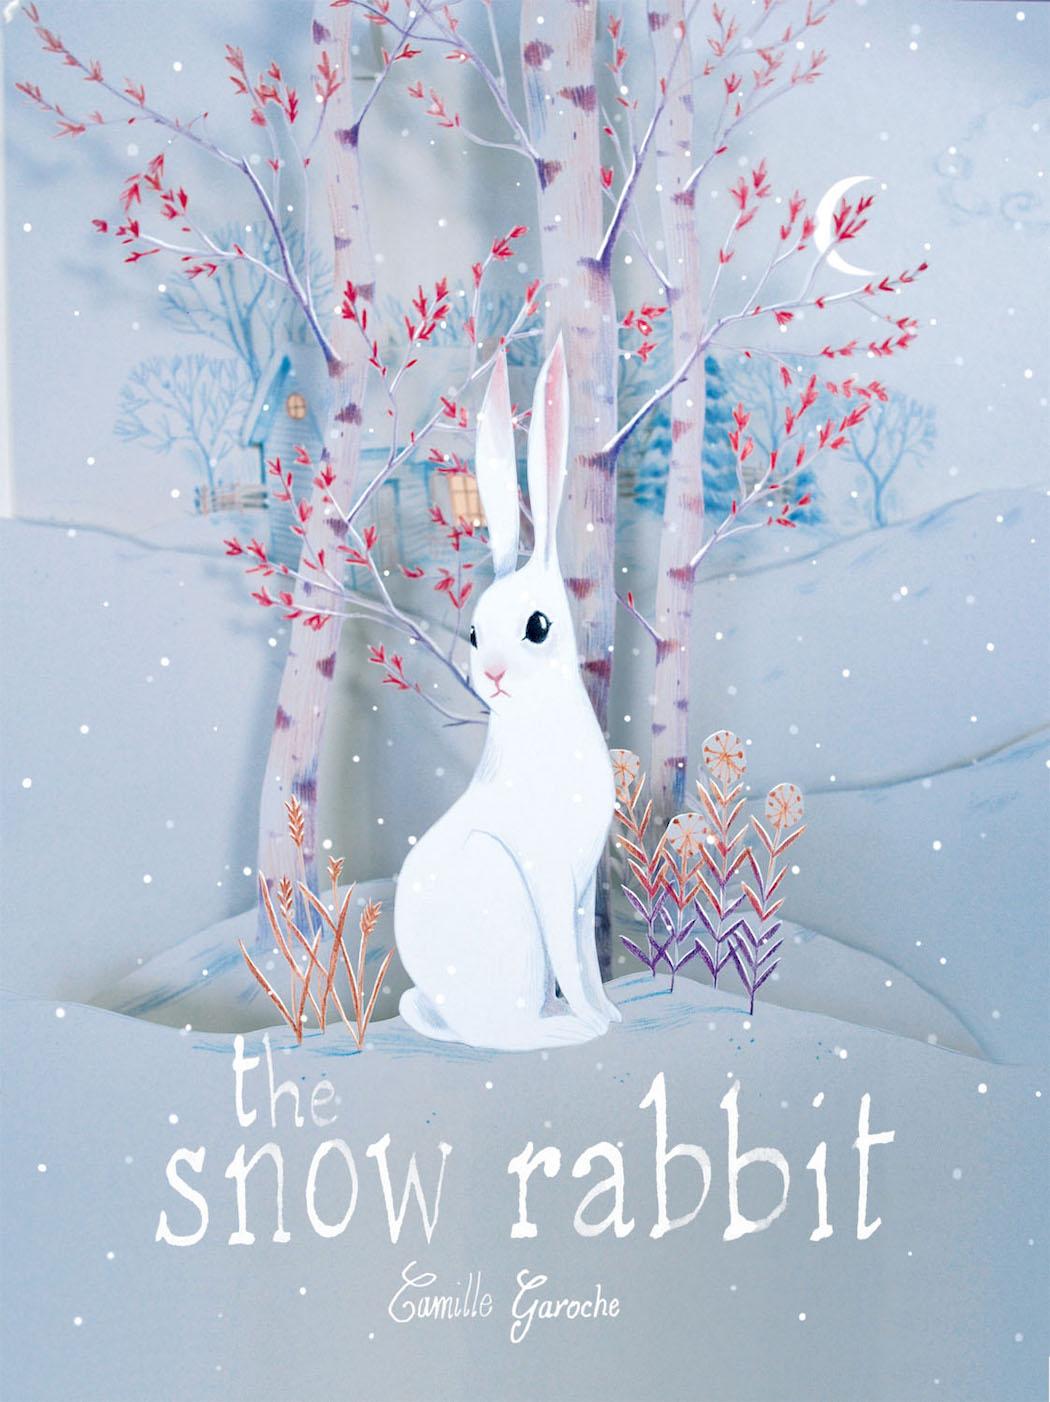 The Snow Rabitt